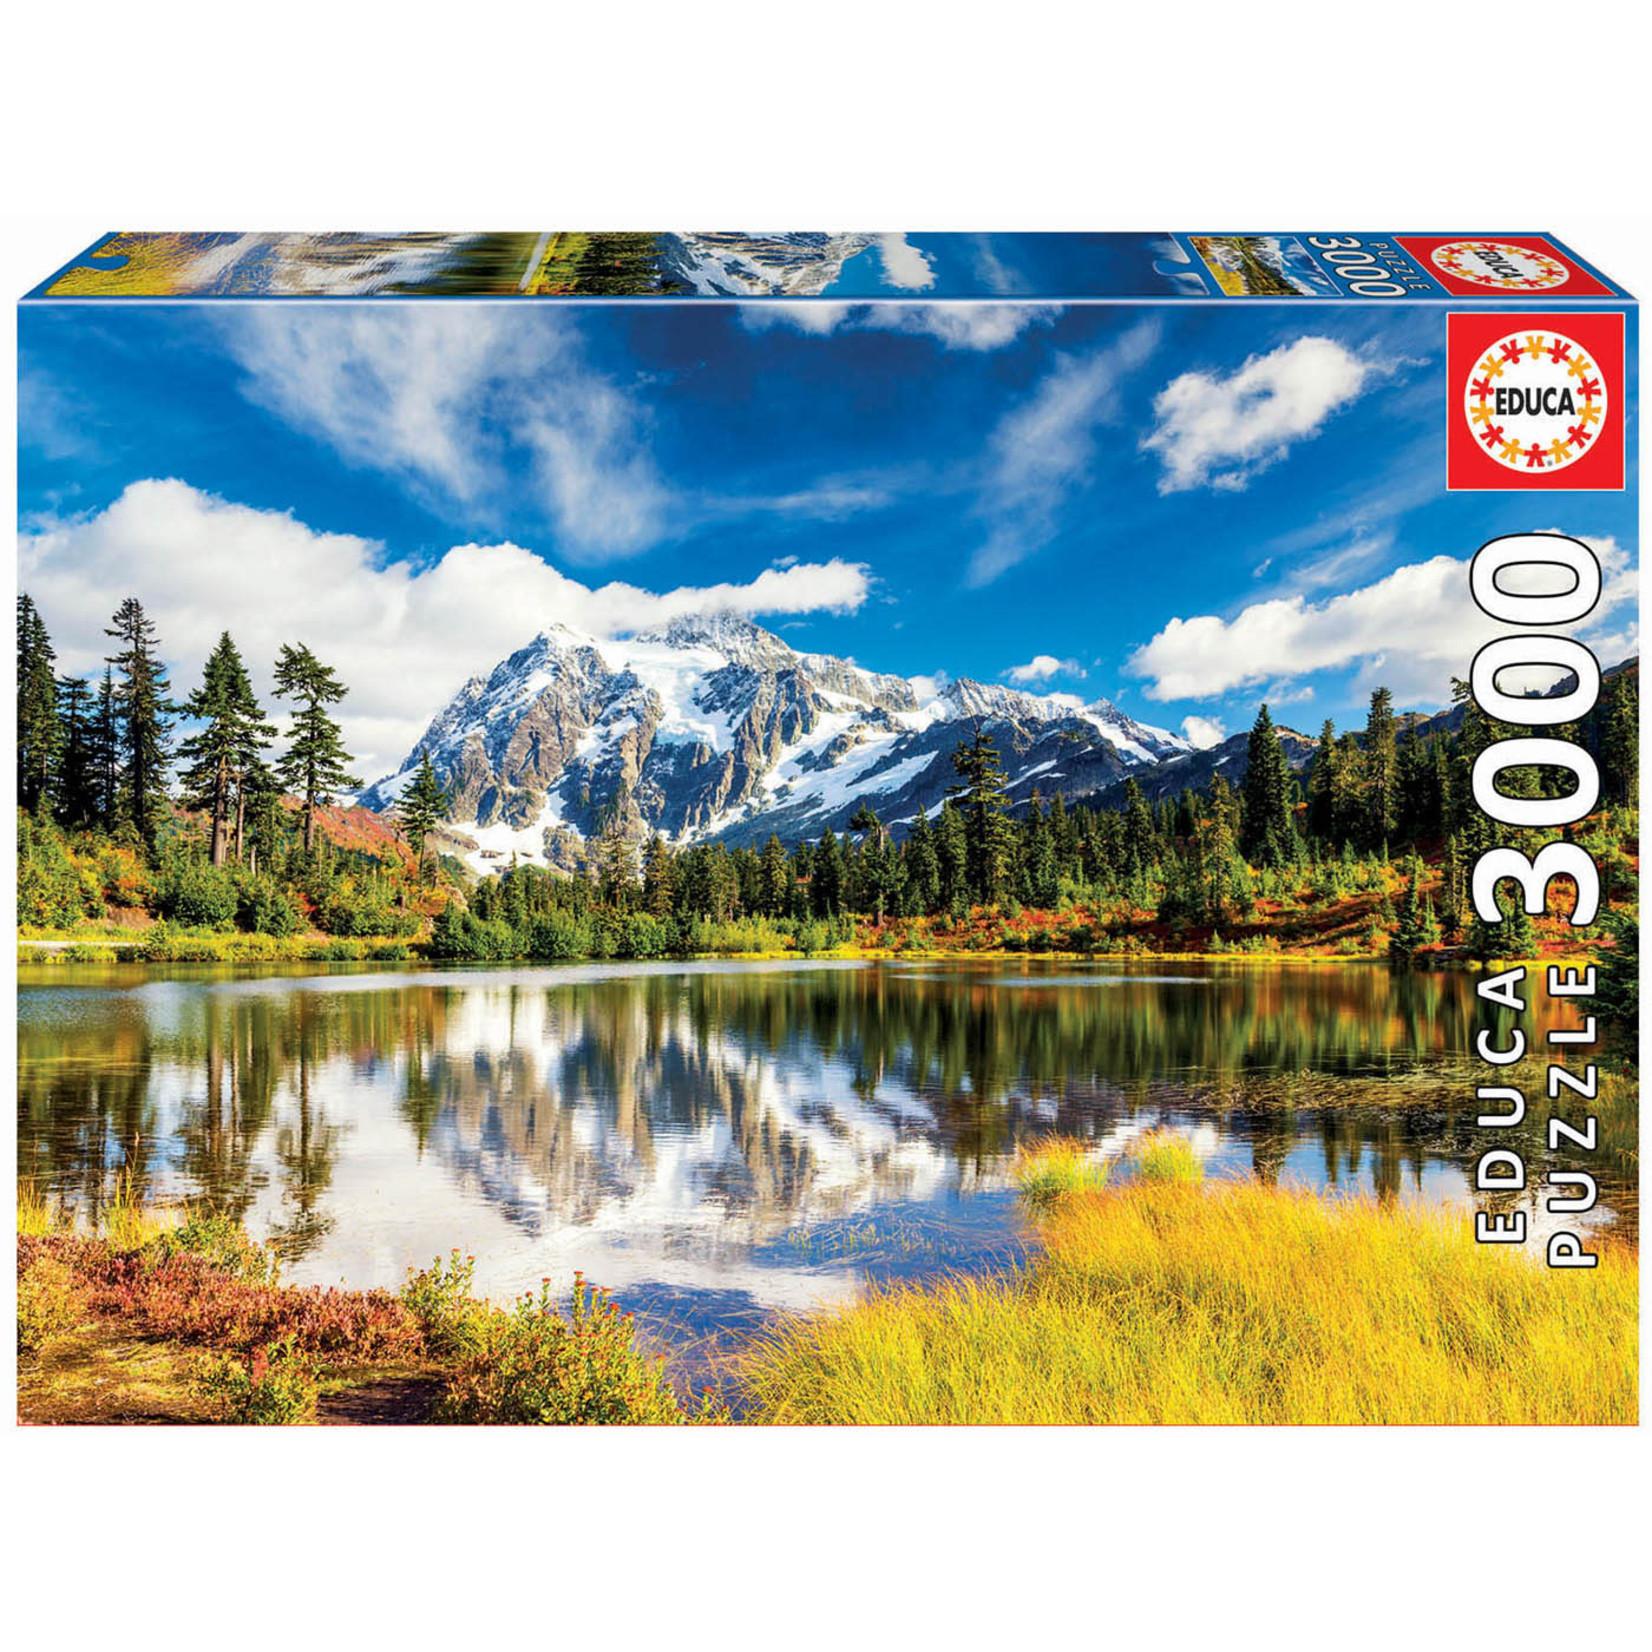 Educa Puzzles Mount Shuksan Washington USA 3000pc